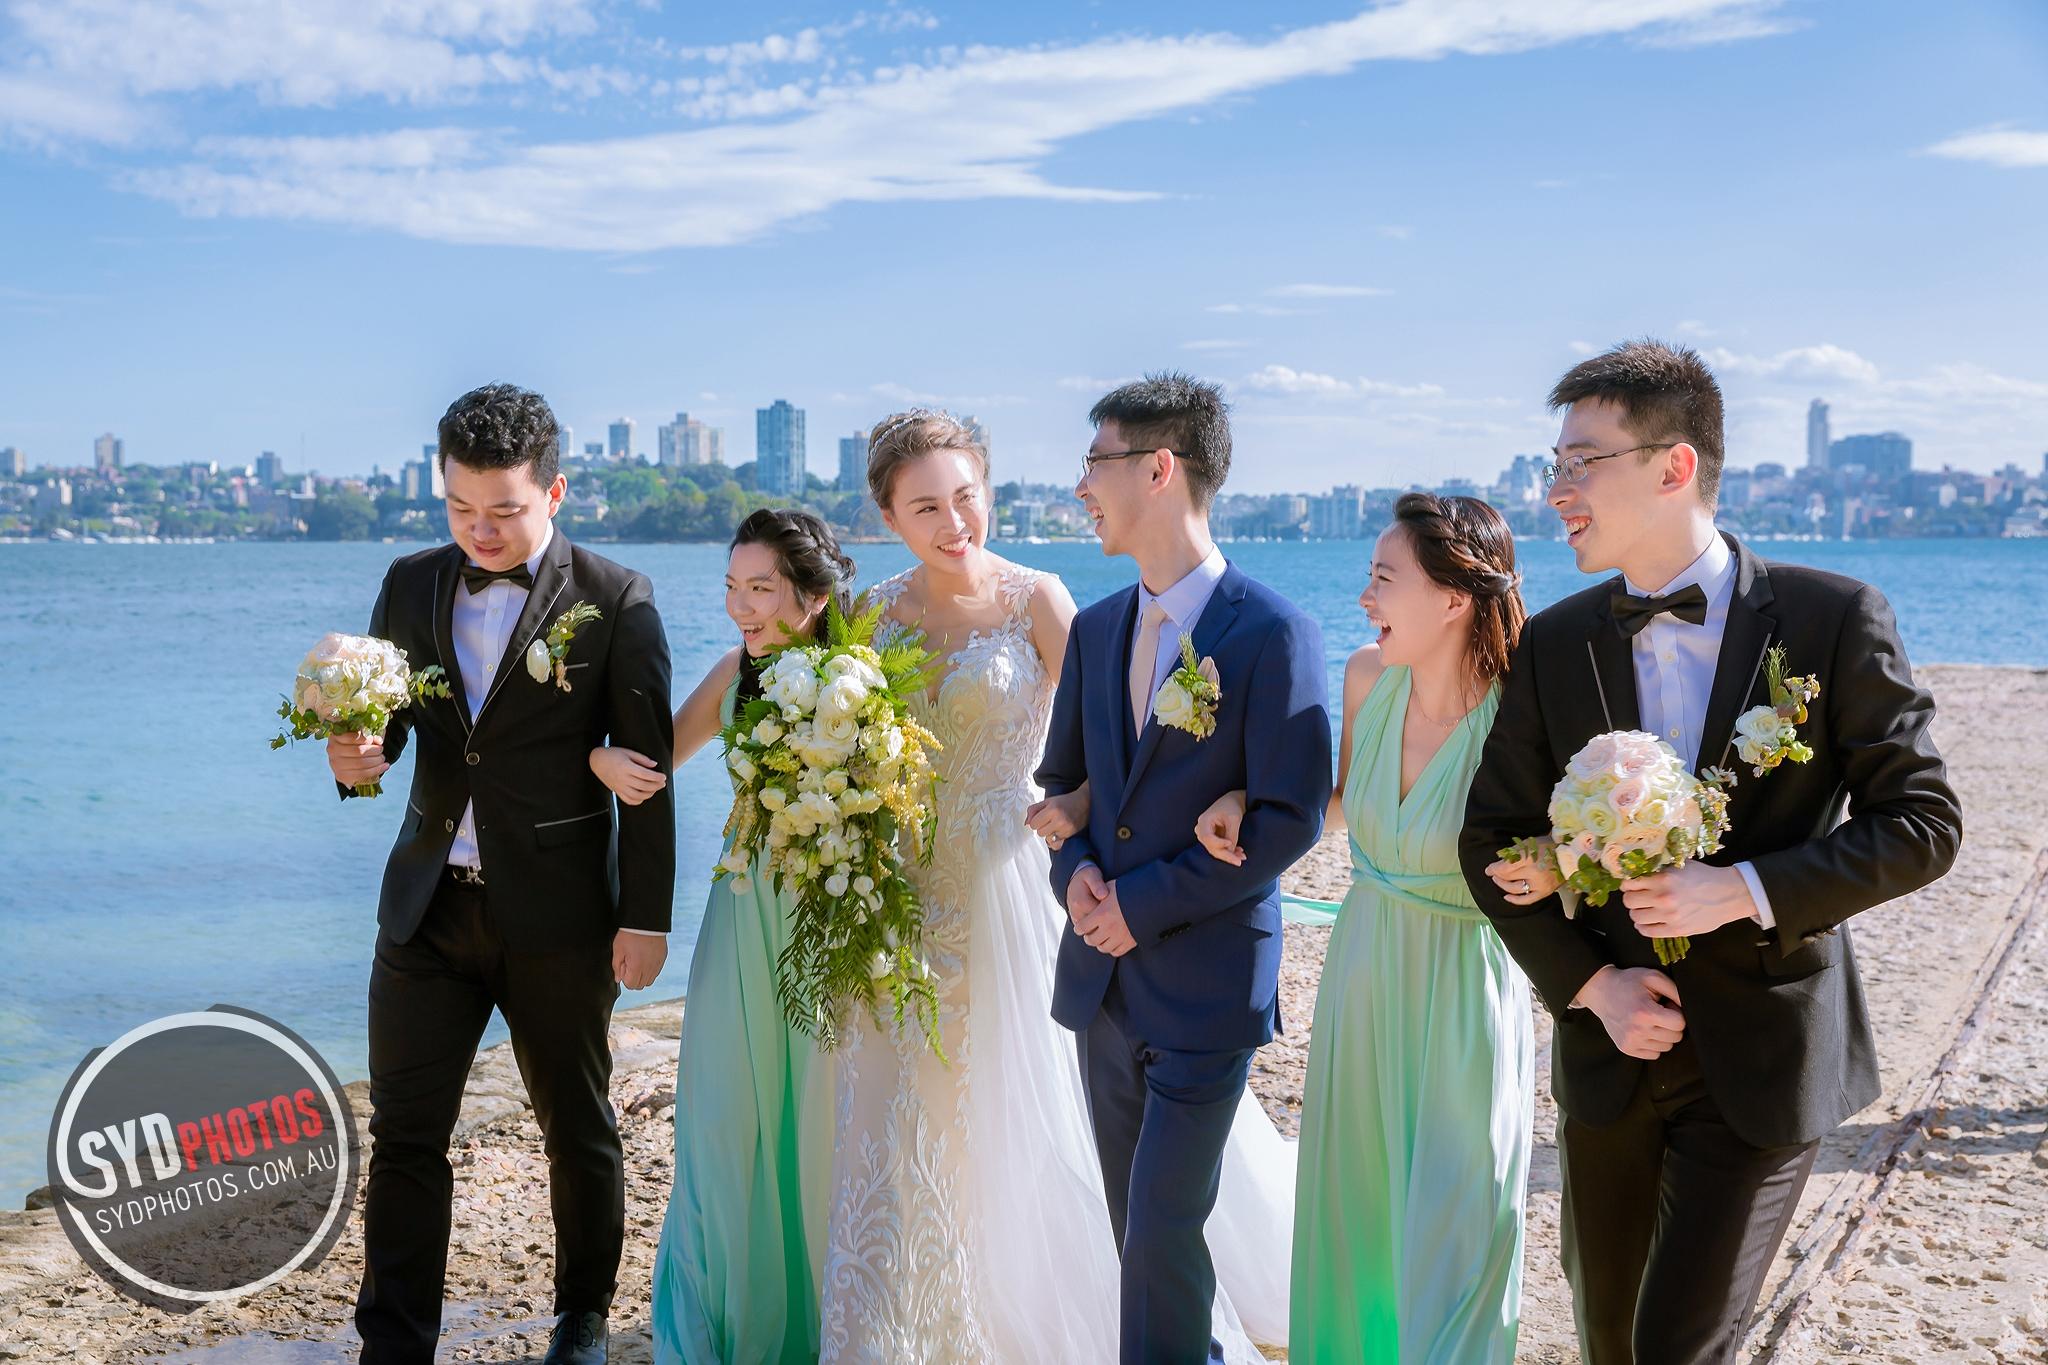 ID-86952-王欢-Wedding-悉尼婚礼摄影